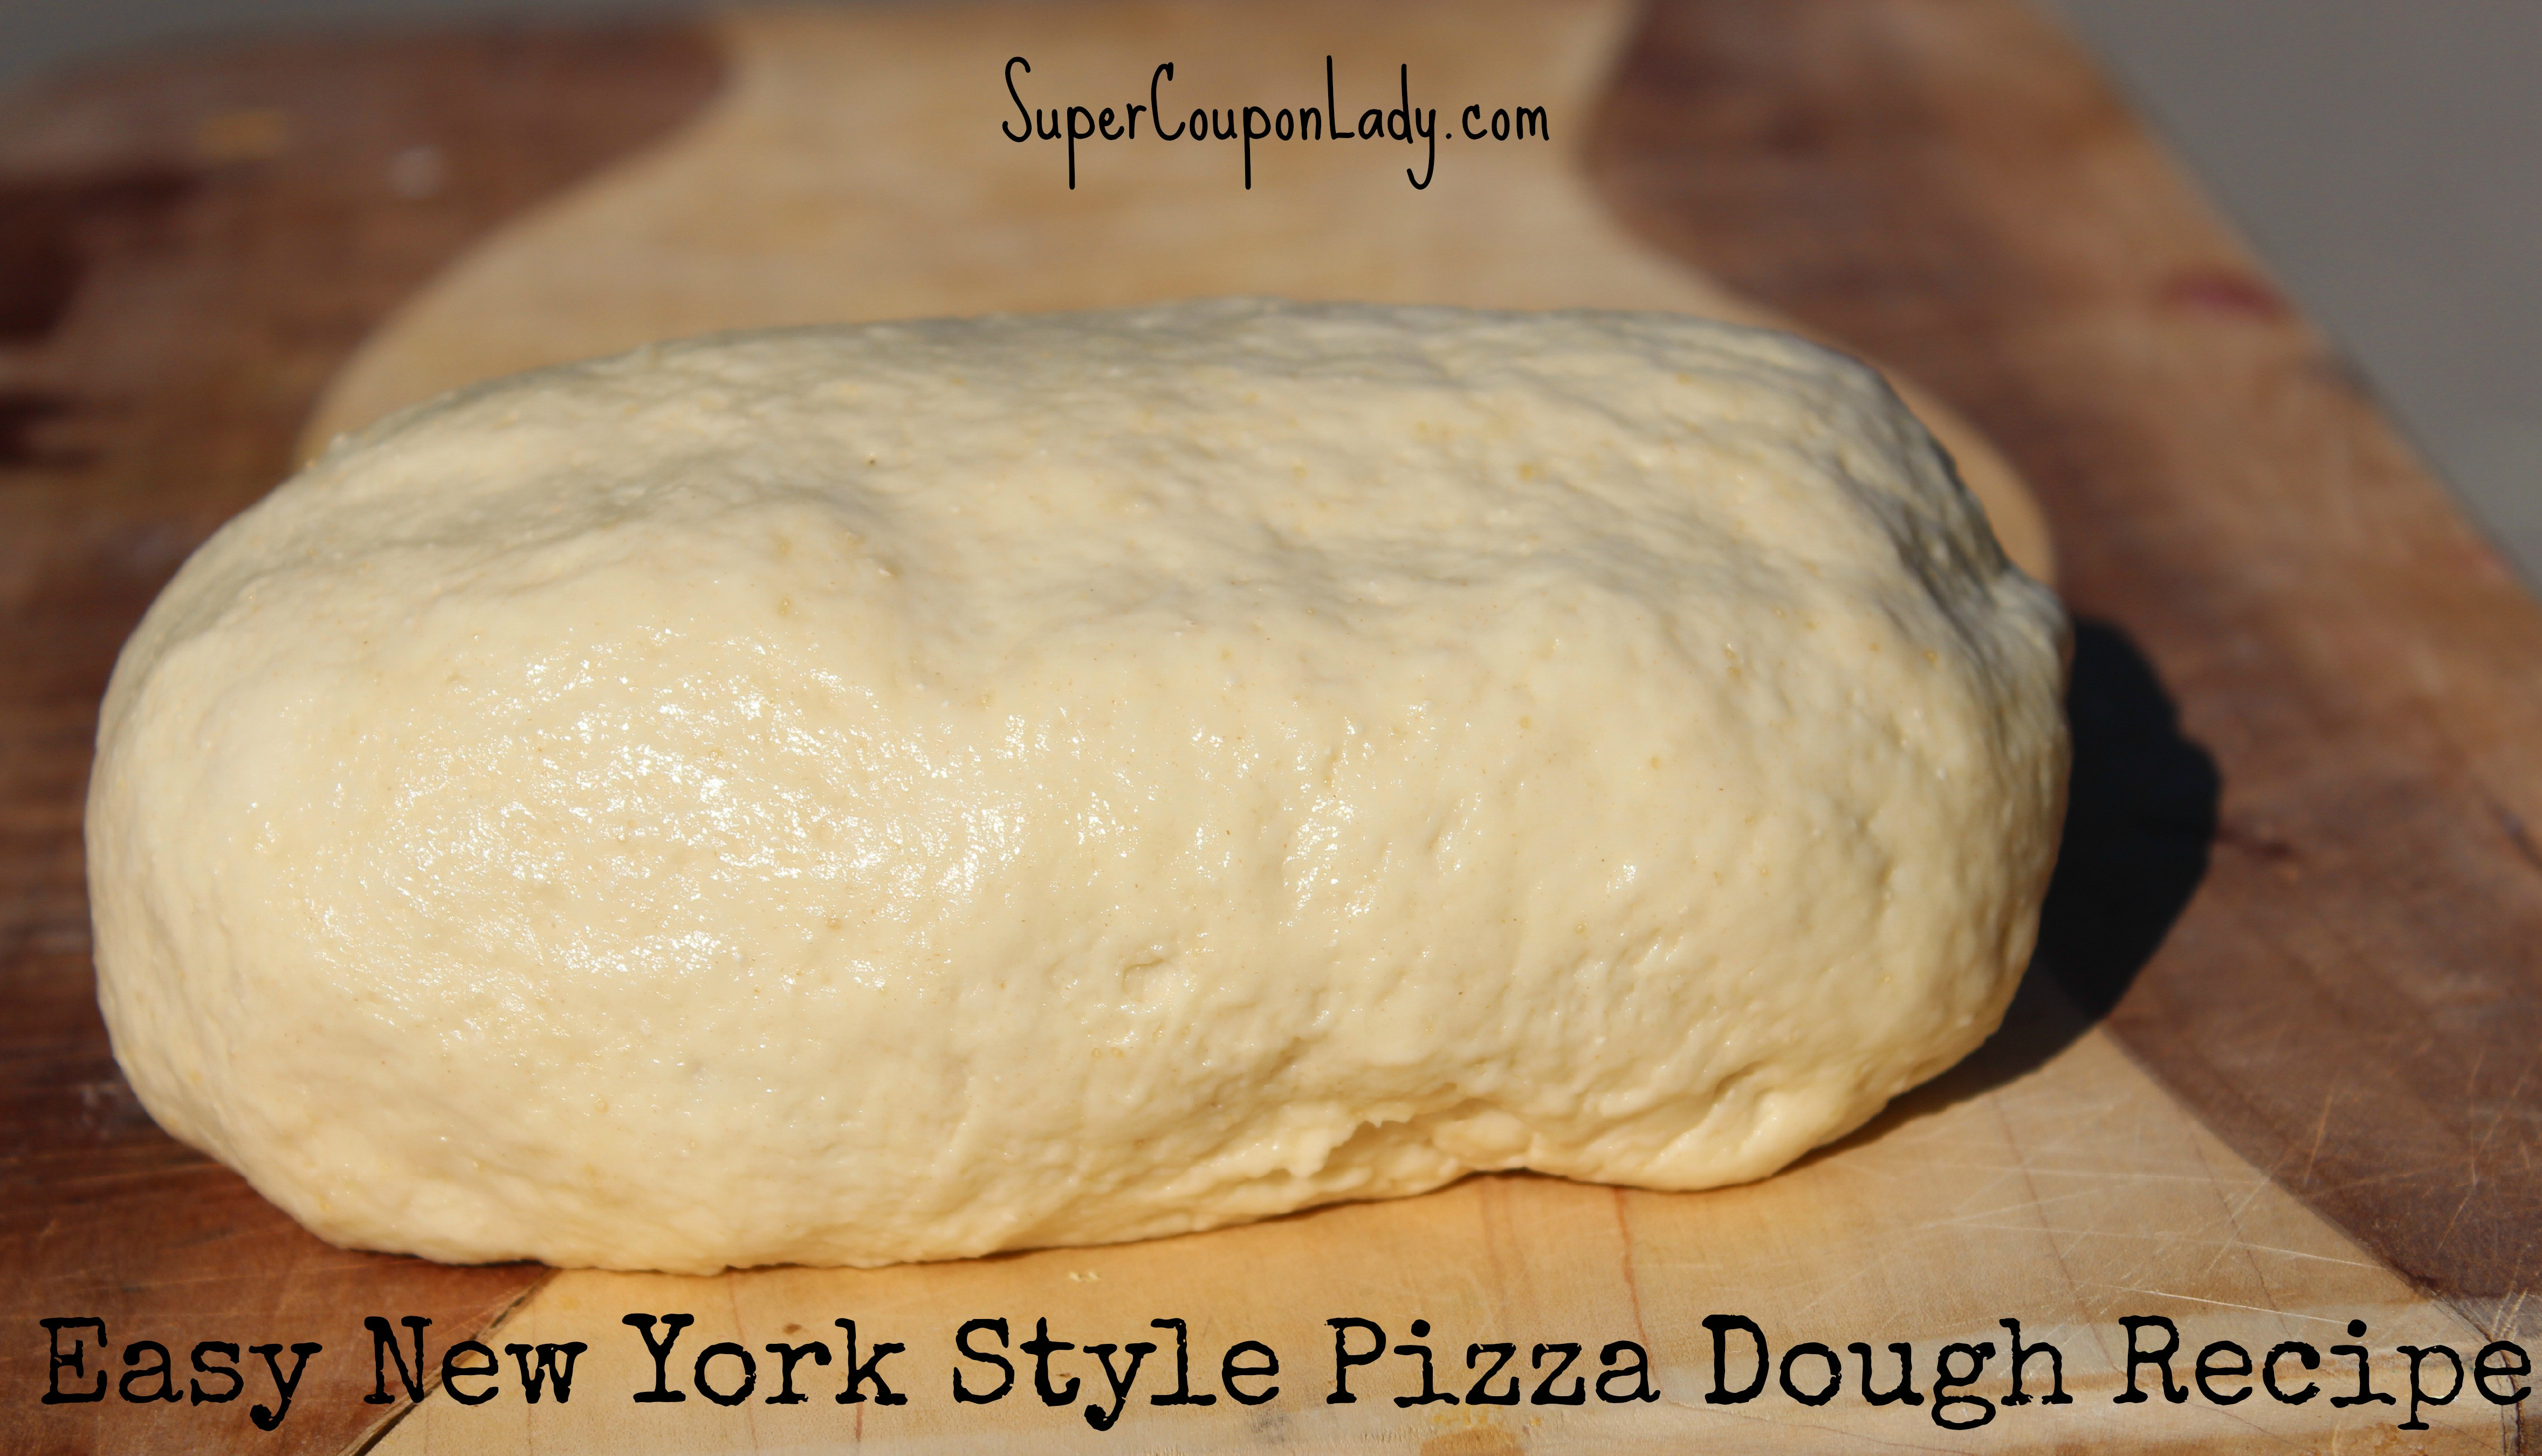 New York Style Pizza Dough Recipe  Easy New York Style Pizza Dough Recipe